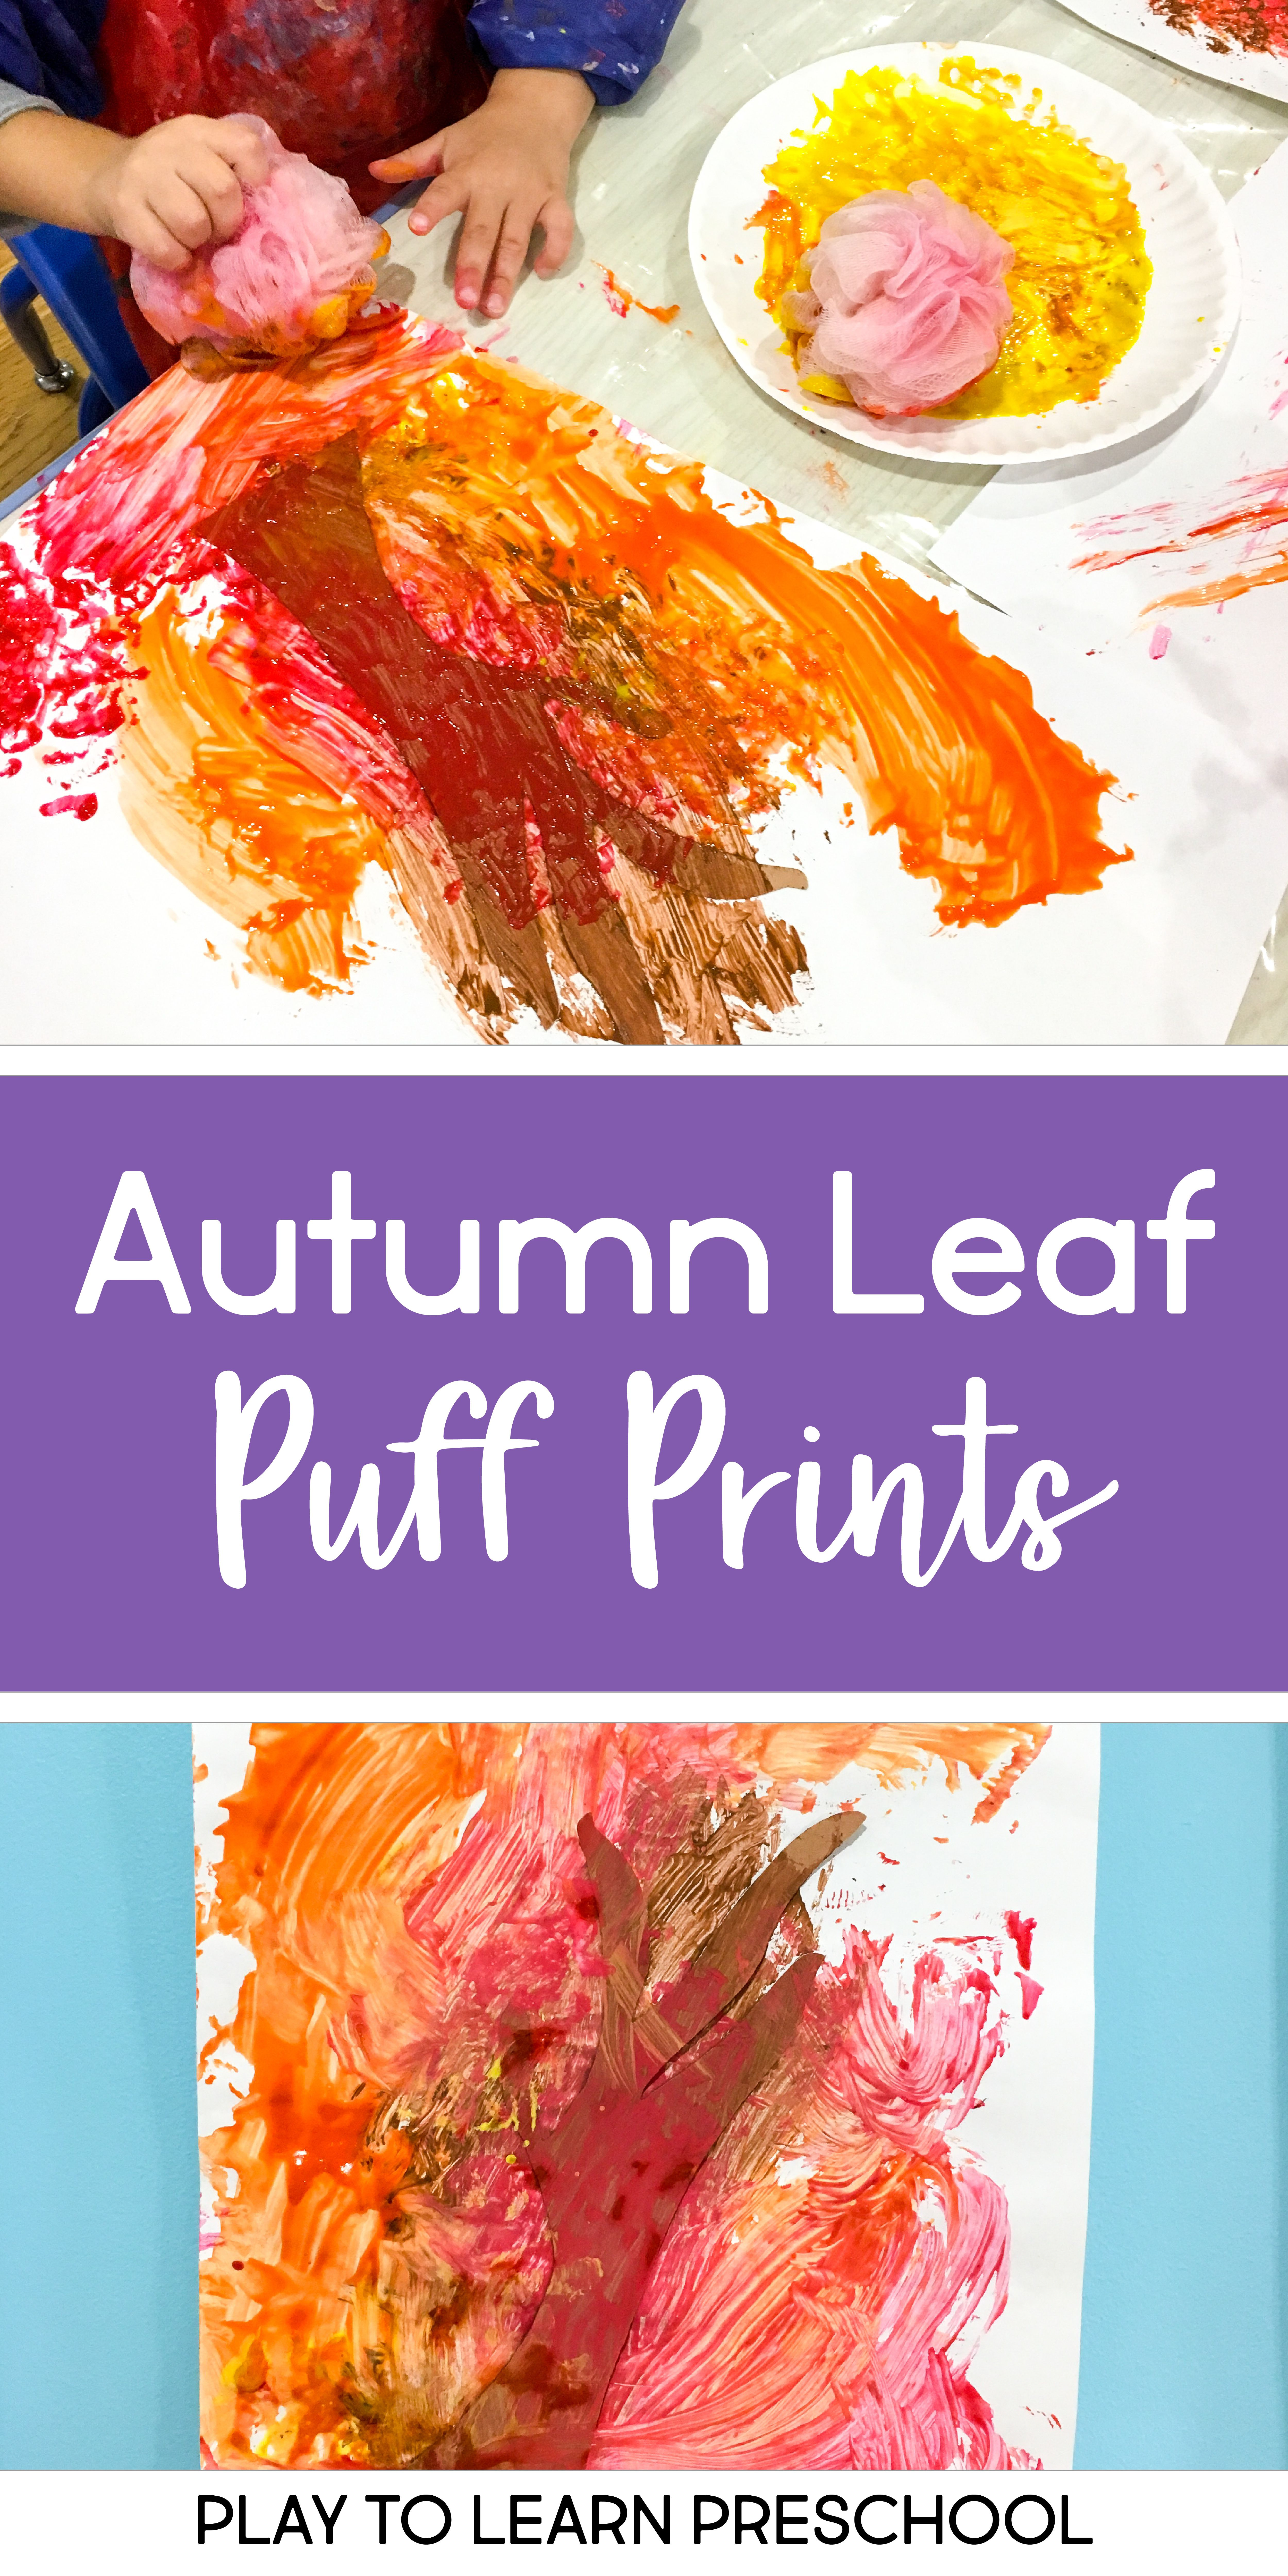 Autumn Leaf Puff Prints